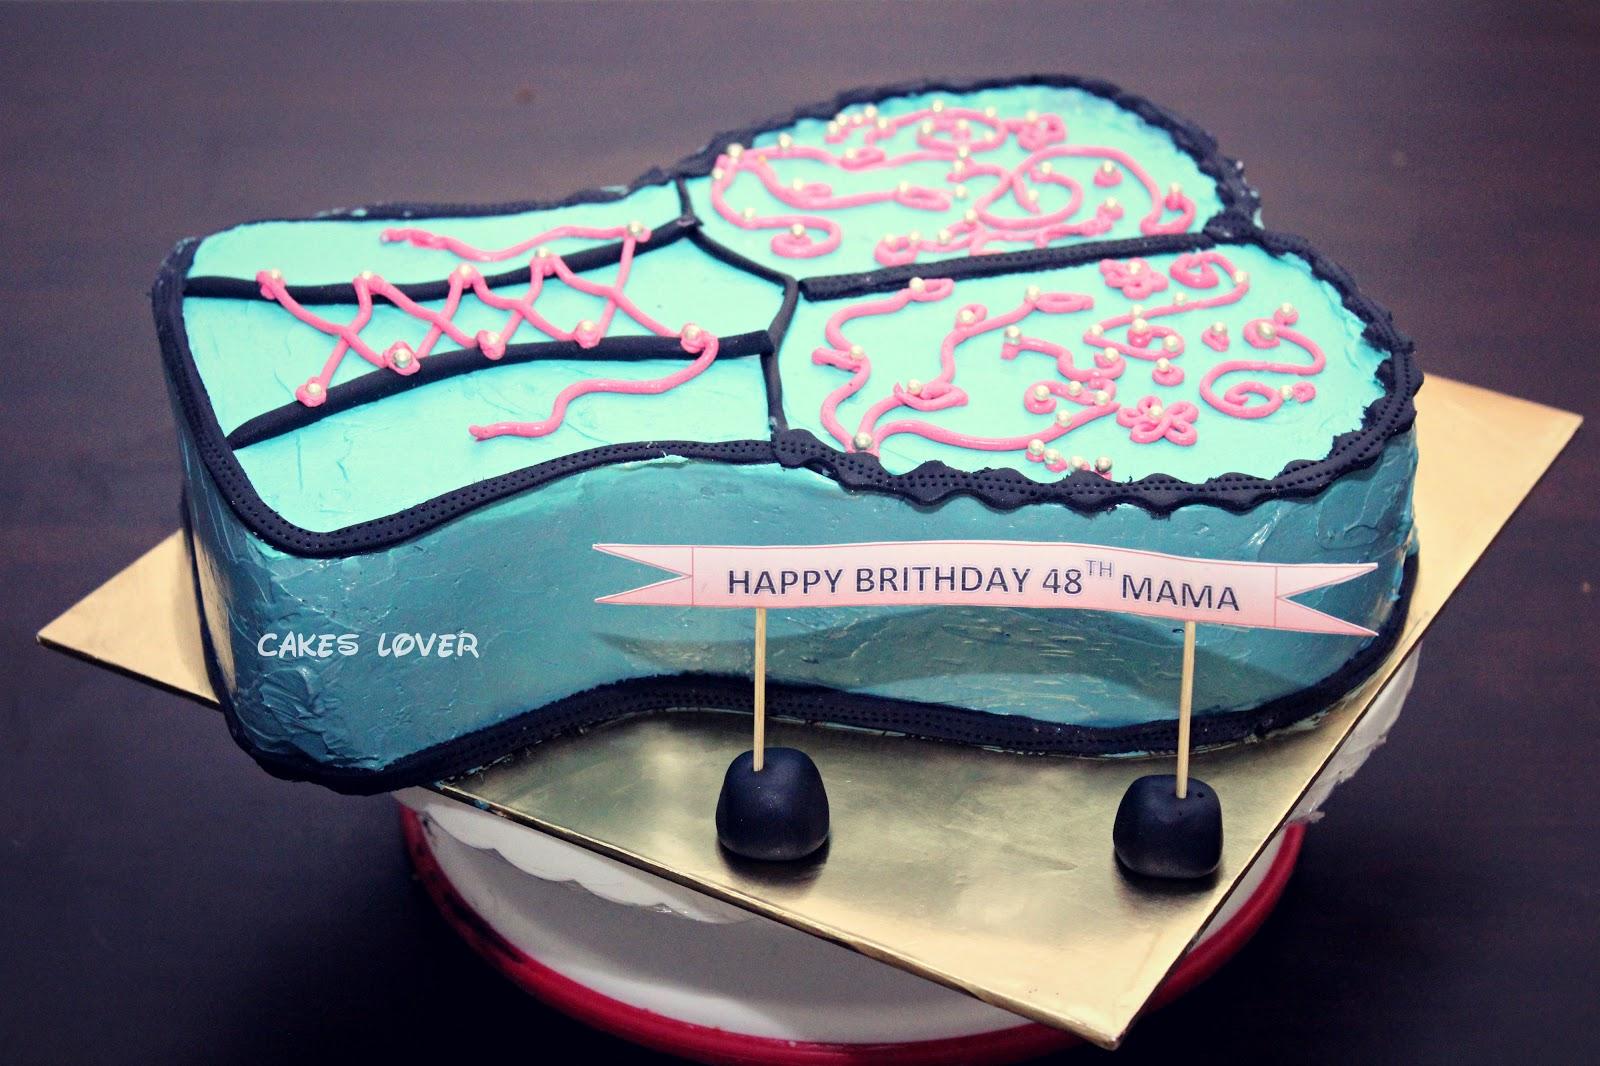 Corset Cake For Mom Birthday Cakes Lover By Hanim Othman